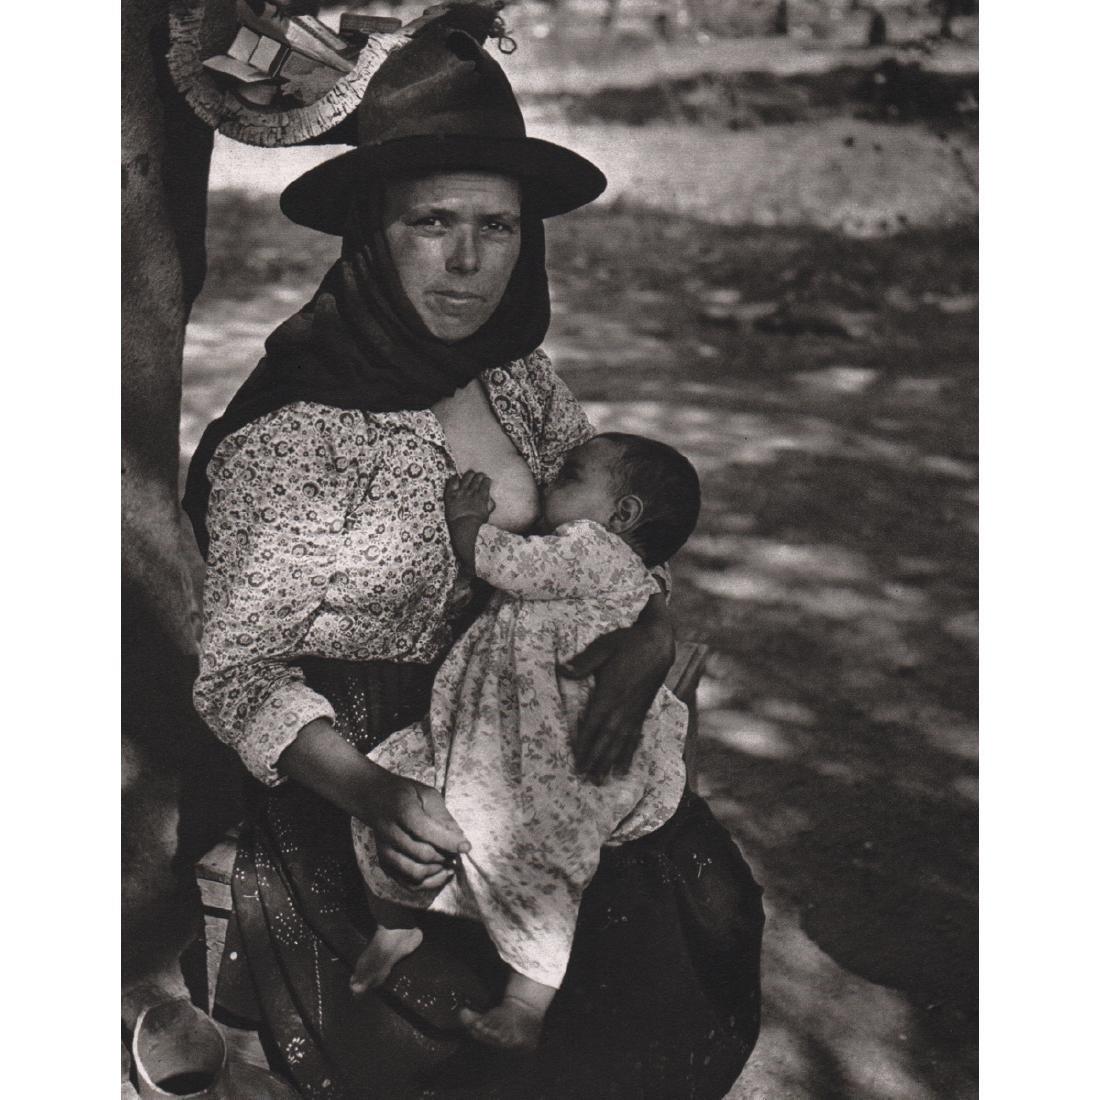 JEAN DIEUZAIDE - Algarve, 1954